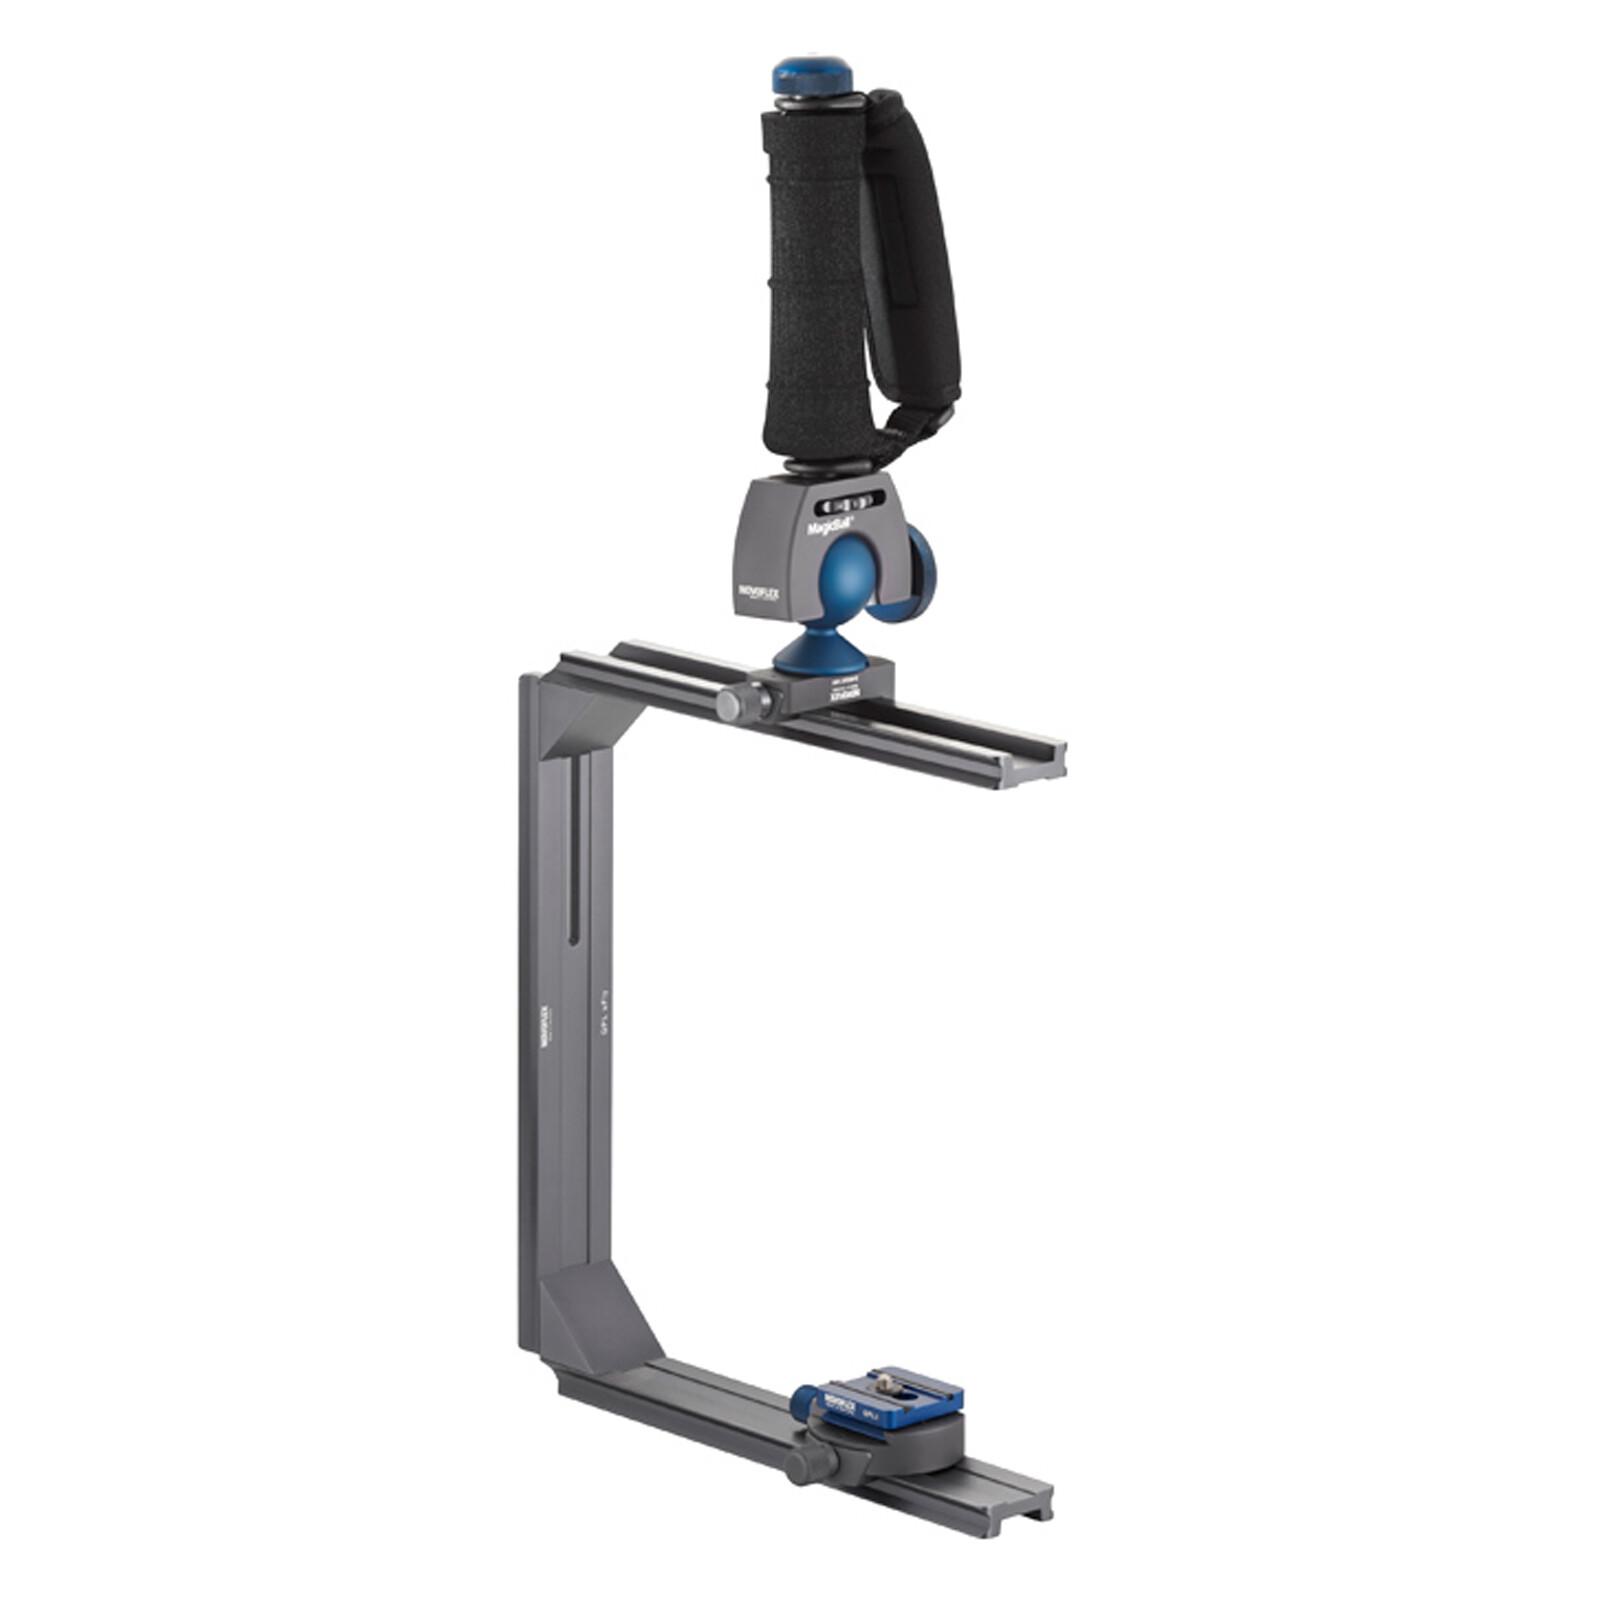 Novoflex MMR-UFLY Schwebendes Haltesystem